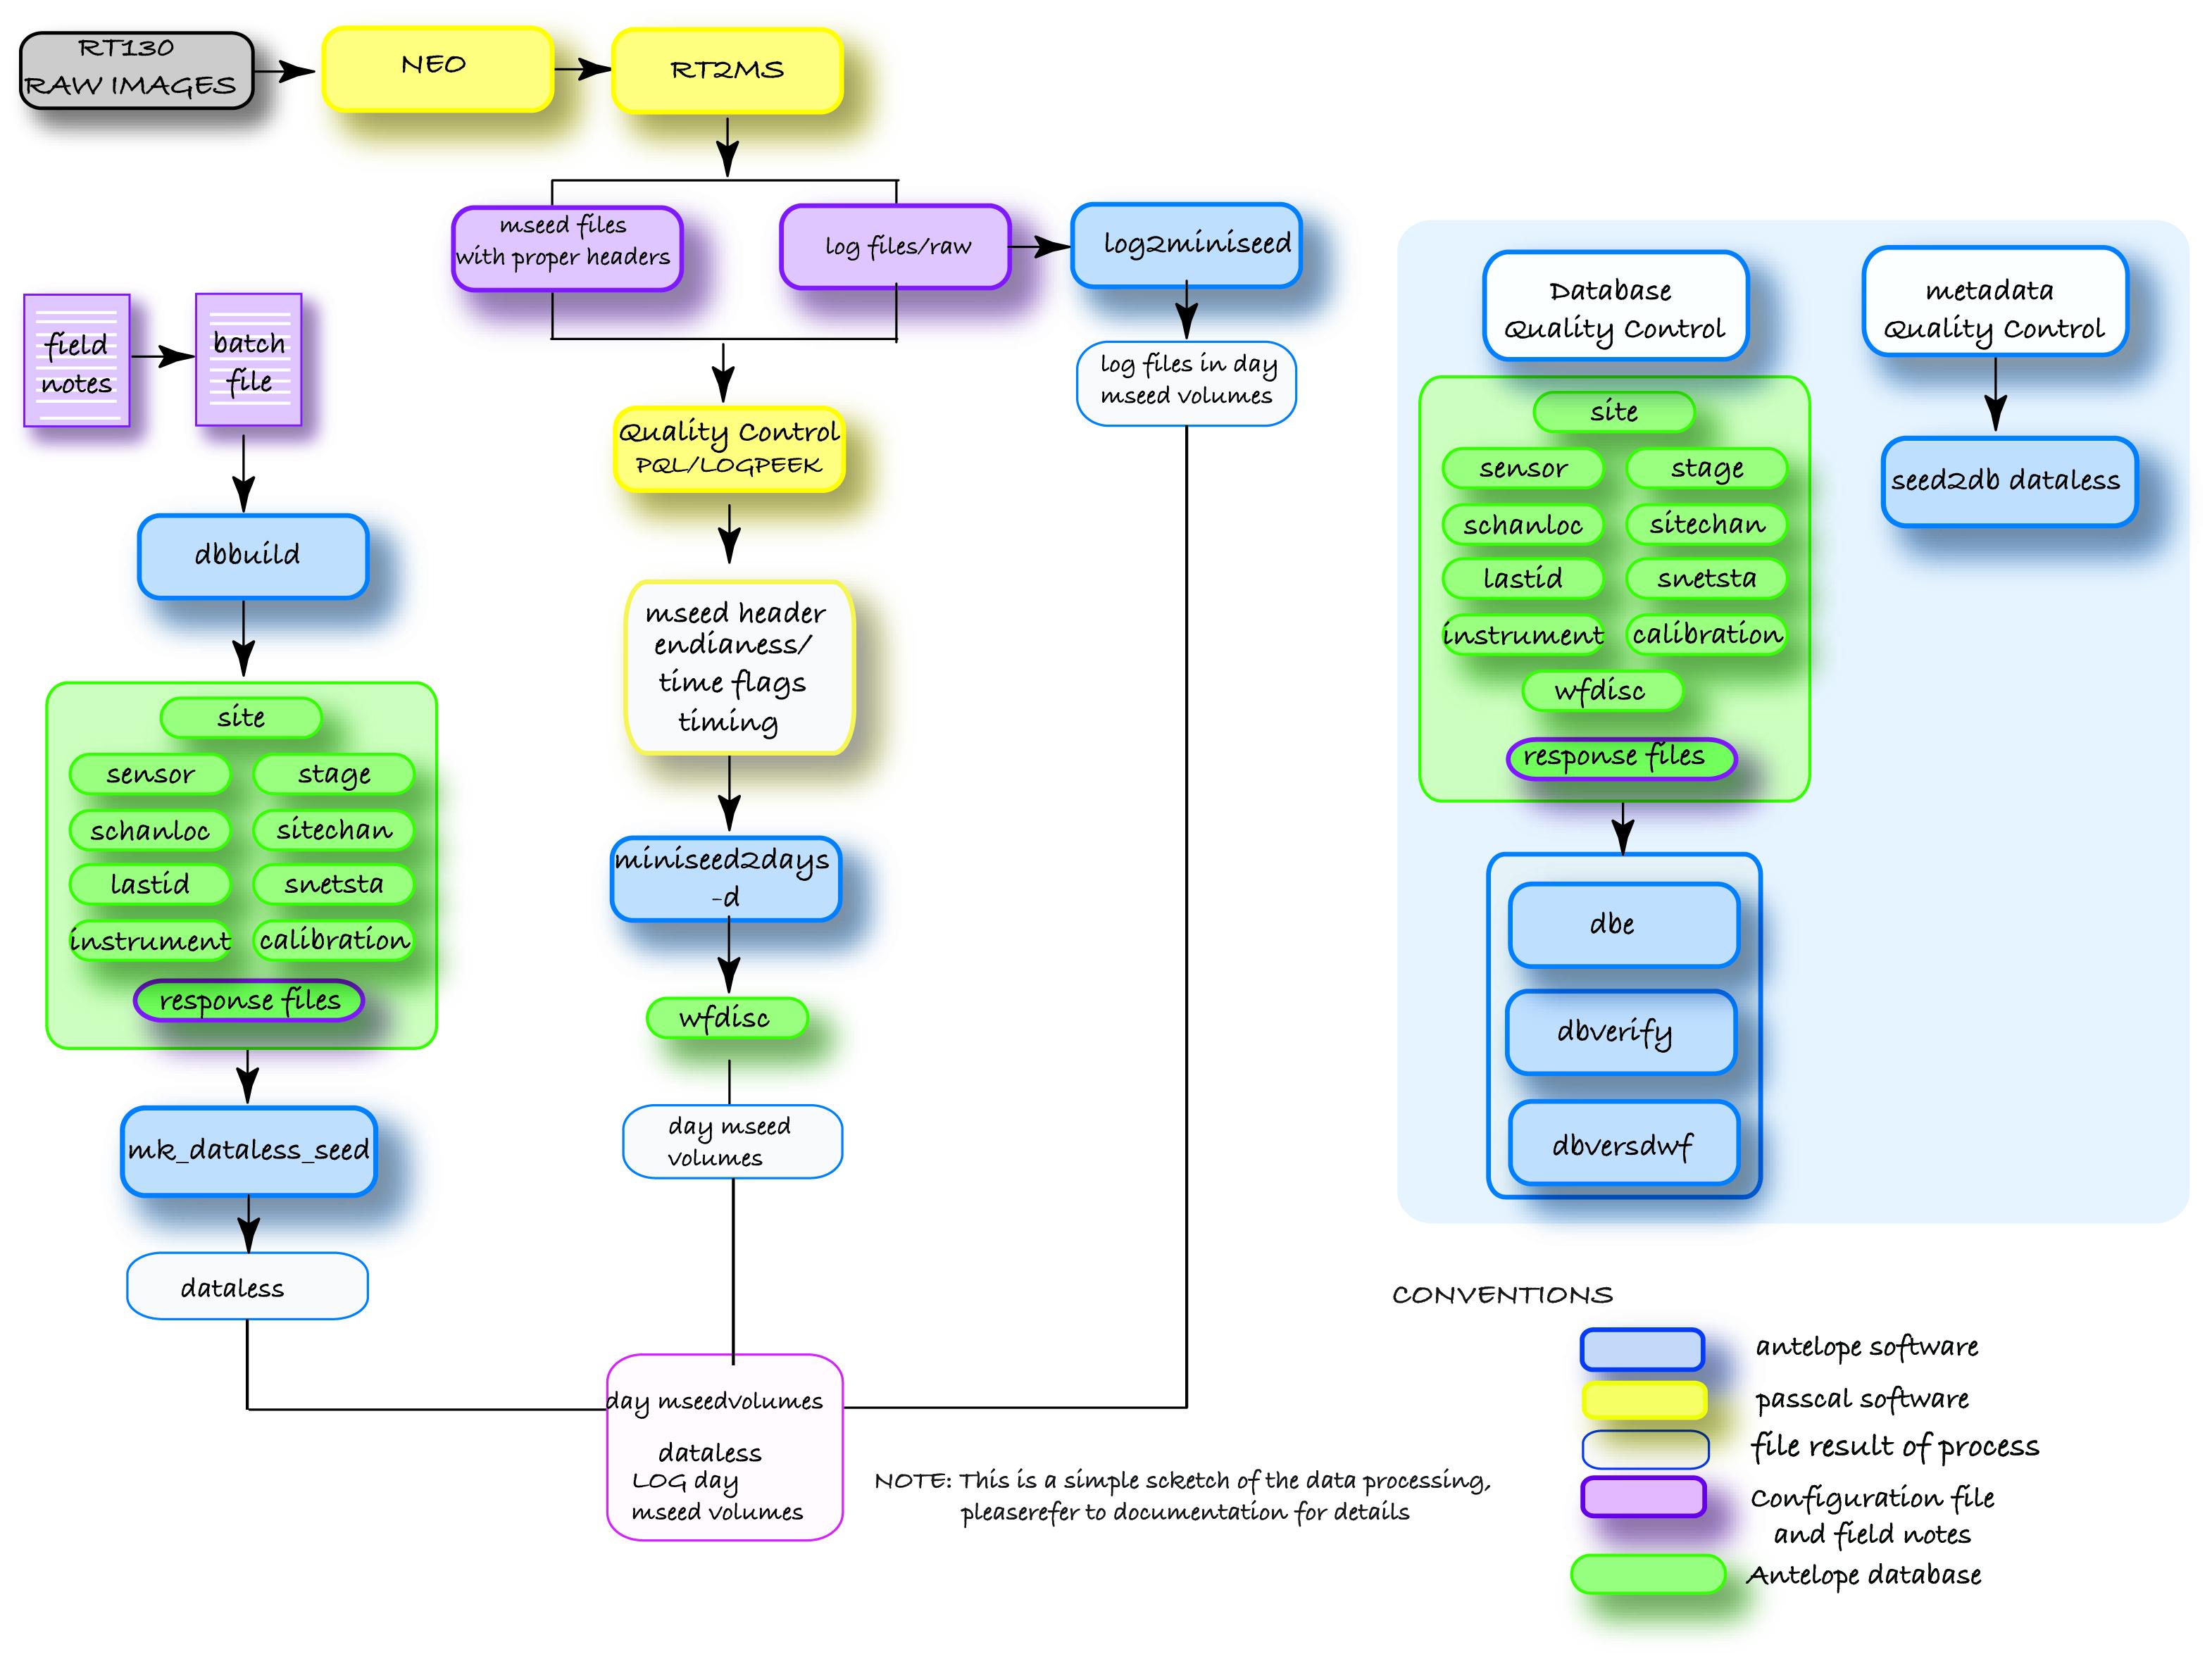 Usarray data management short course data flow q330 jpg 231mb geenschuldenfo Gallery